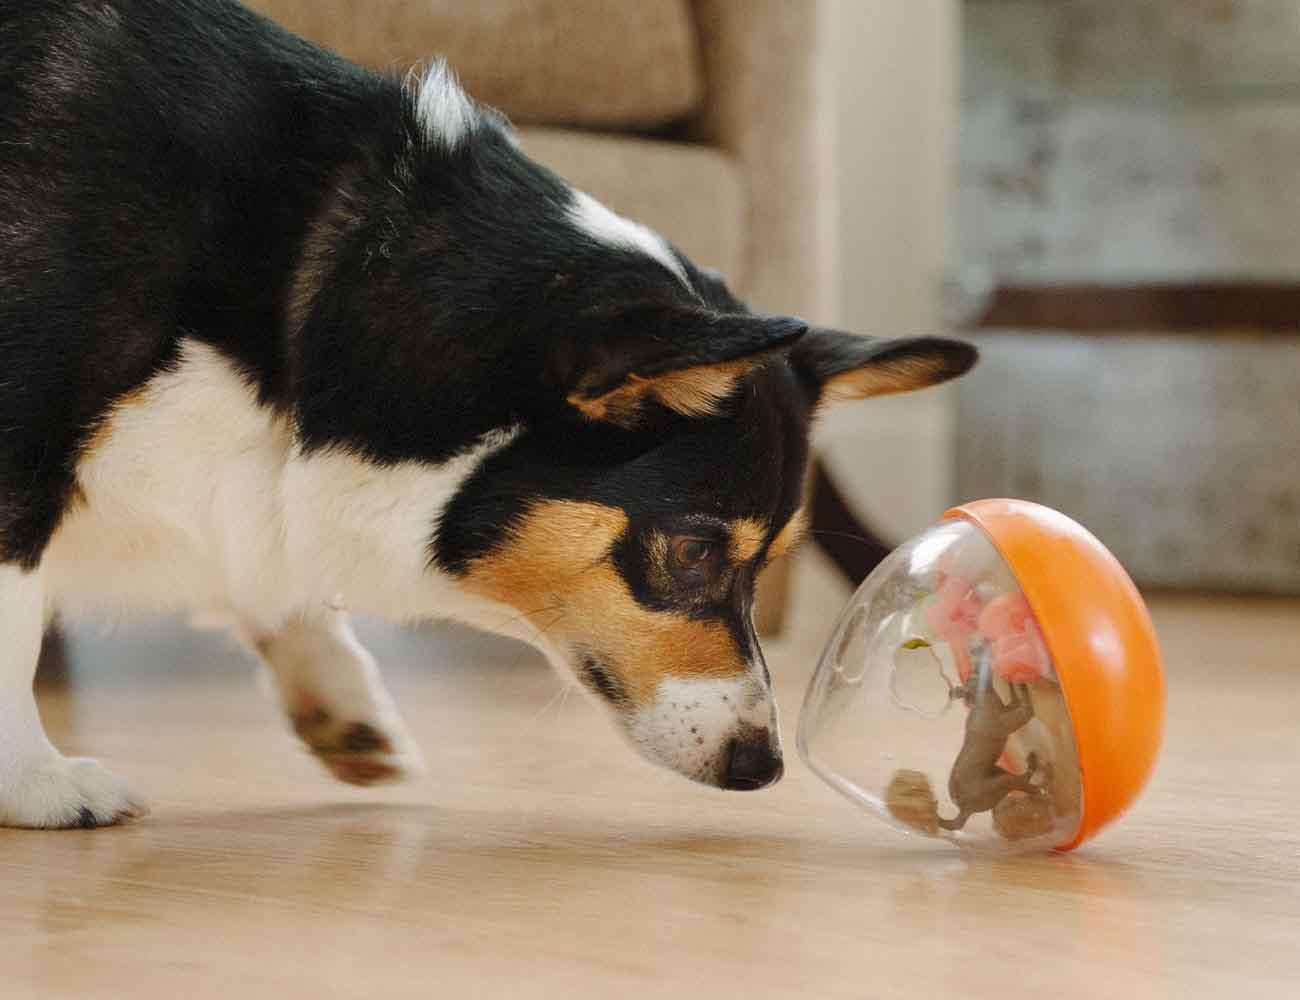 Wobble Ball 2.0 Dog Toy